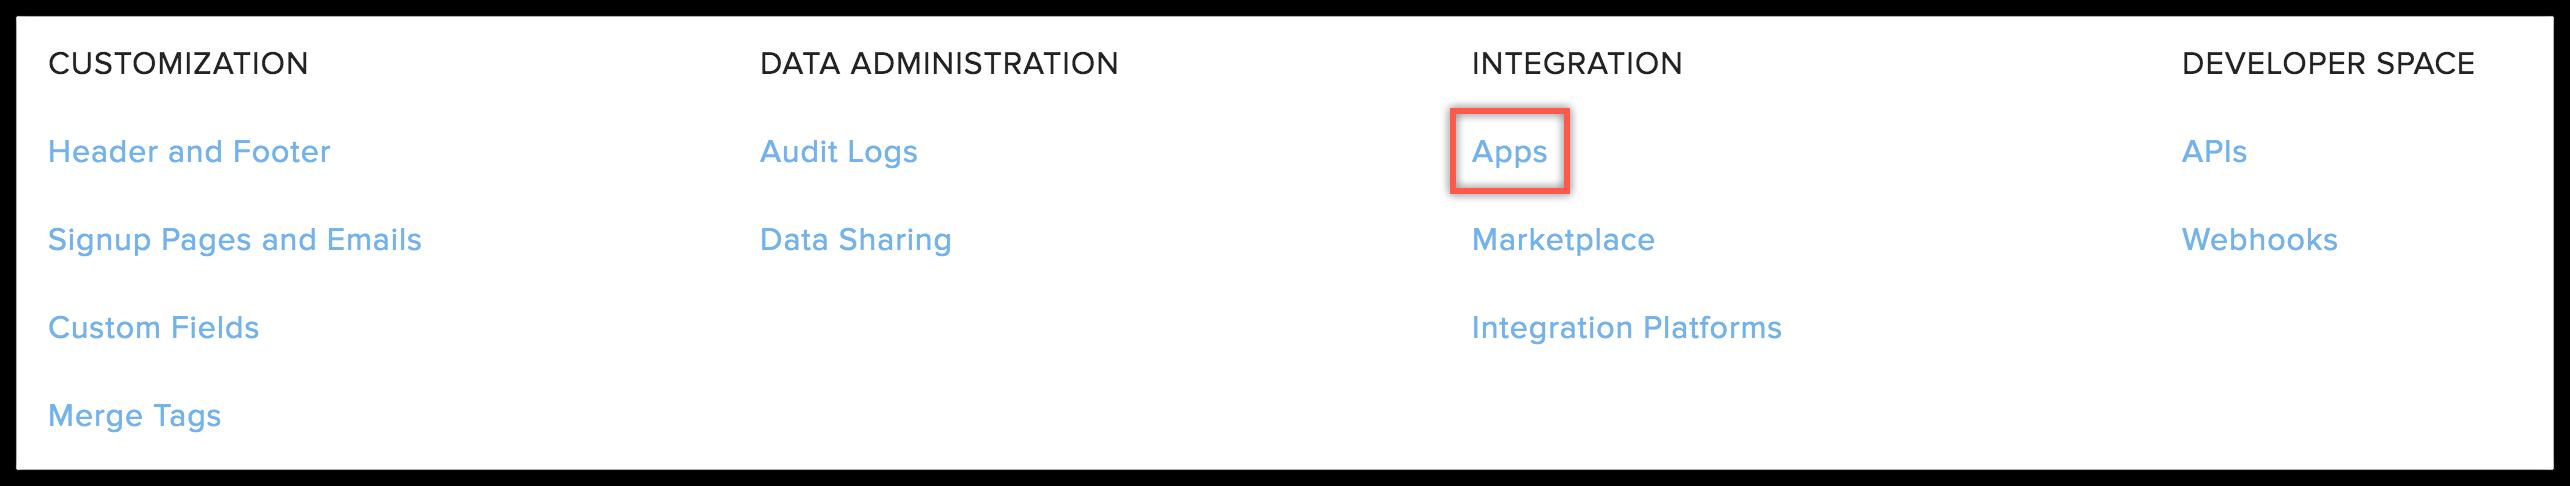 apps under integration